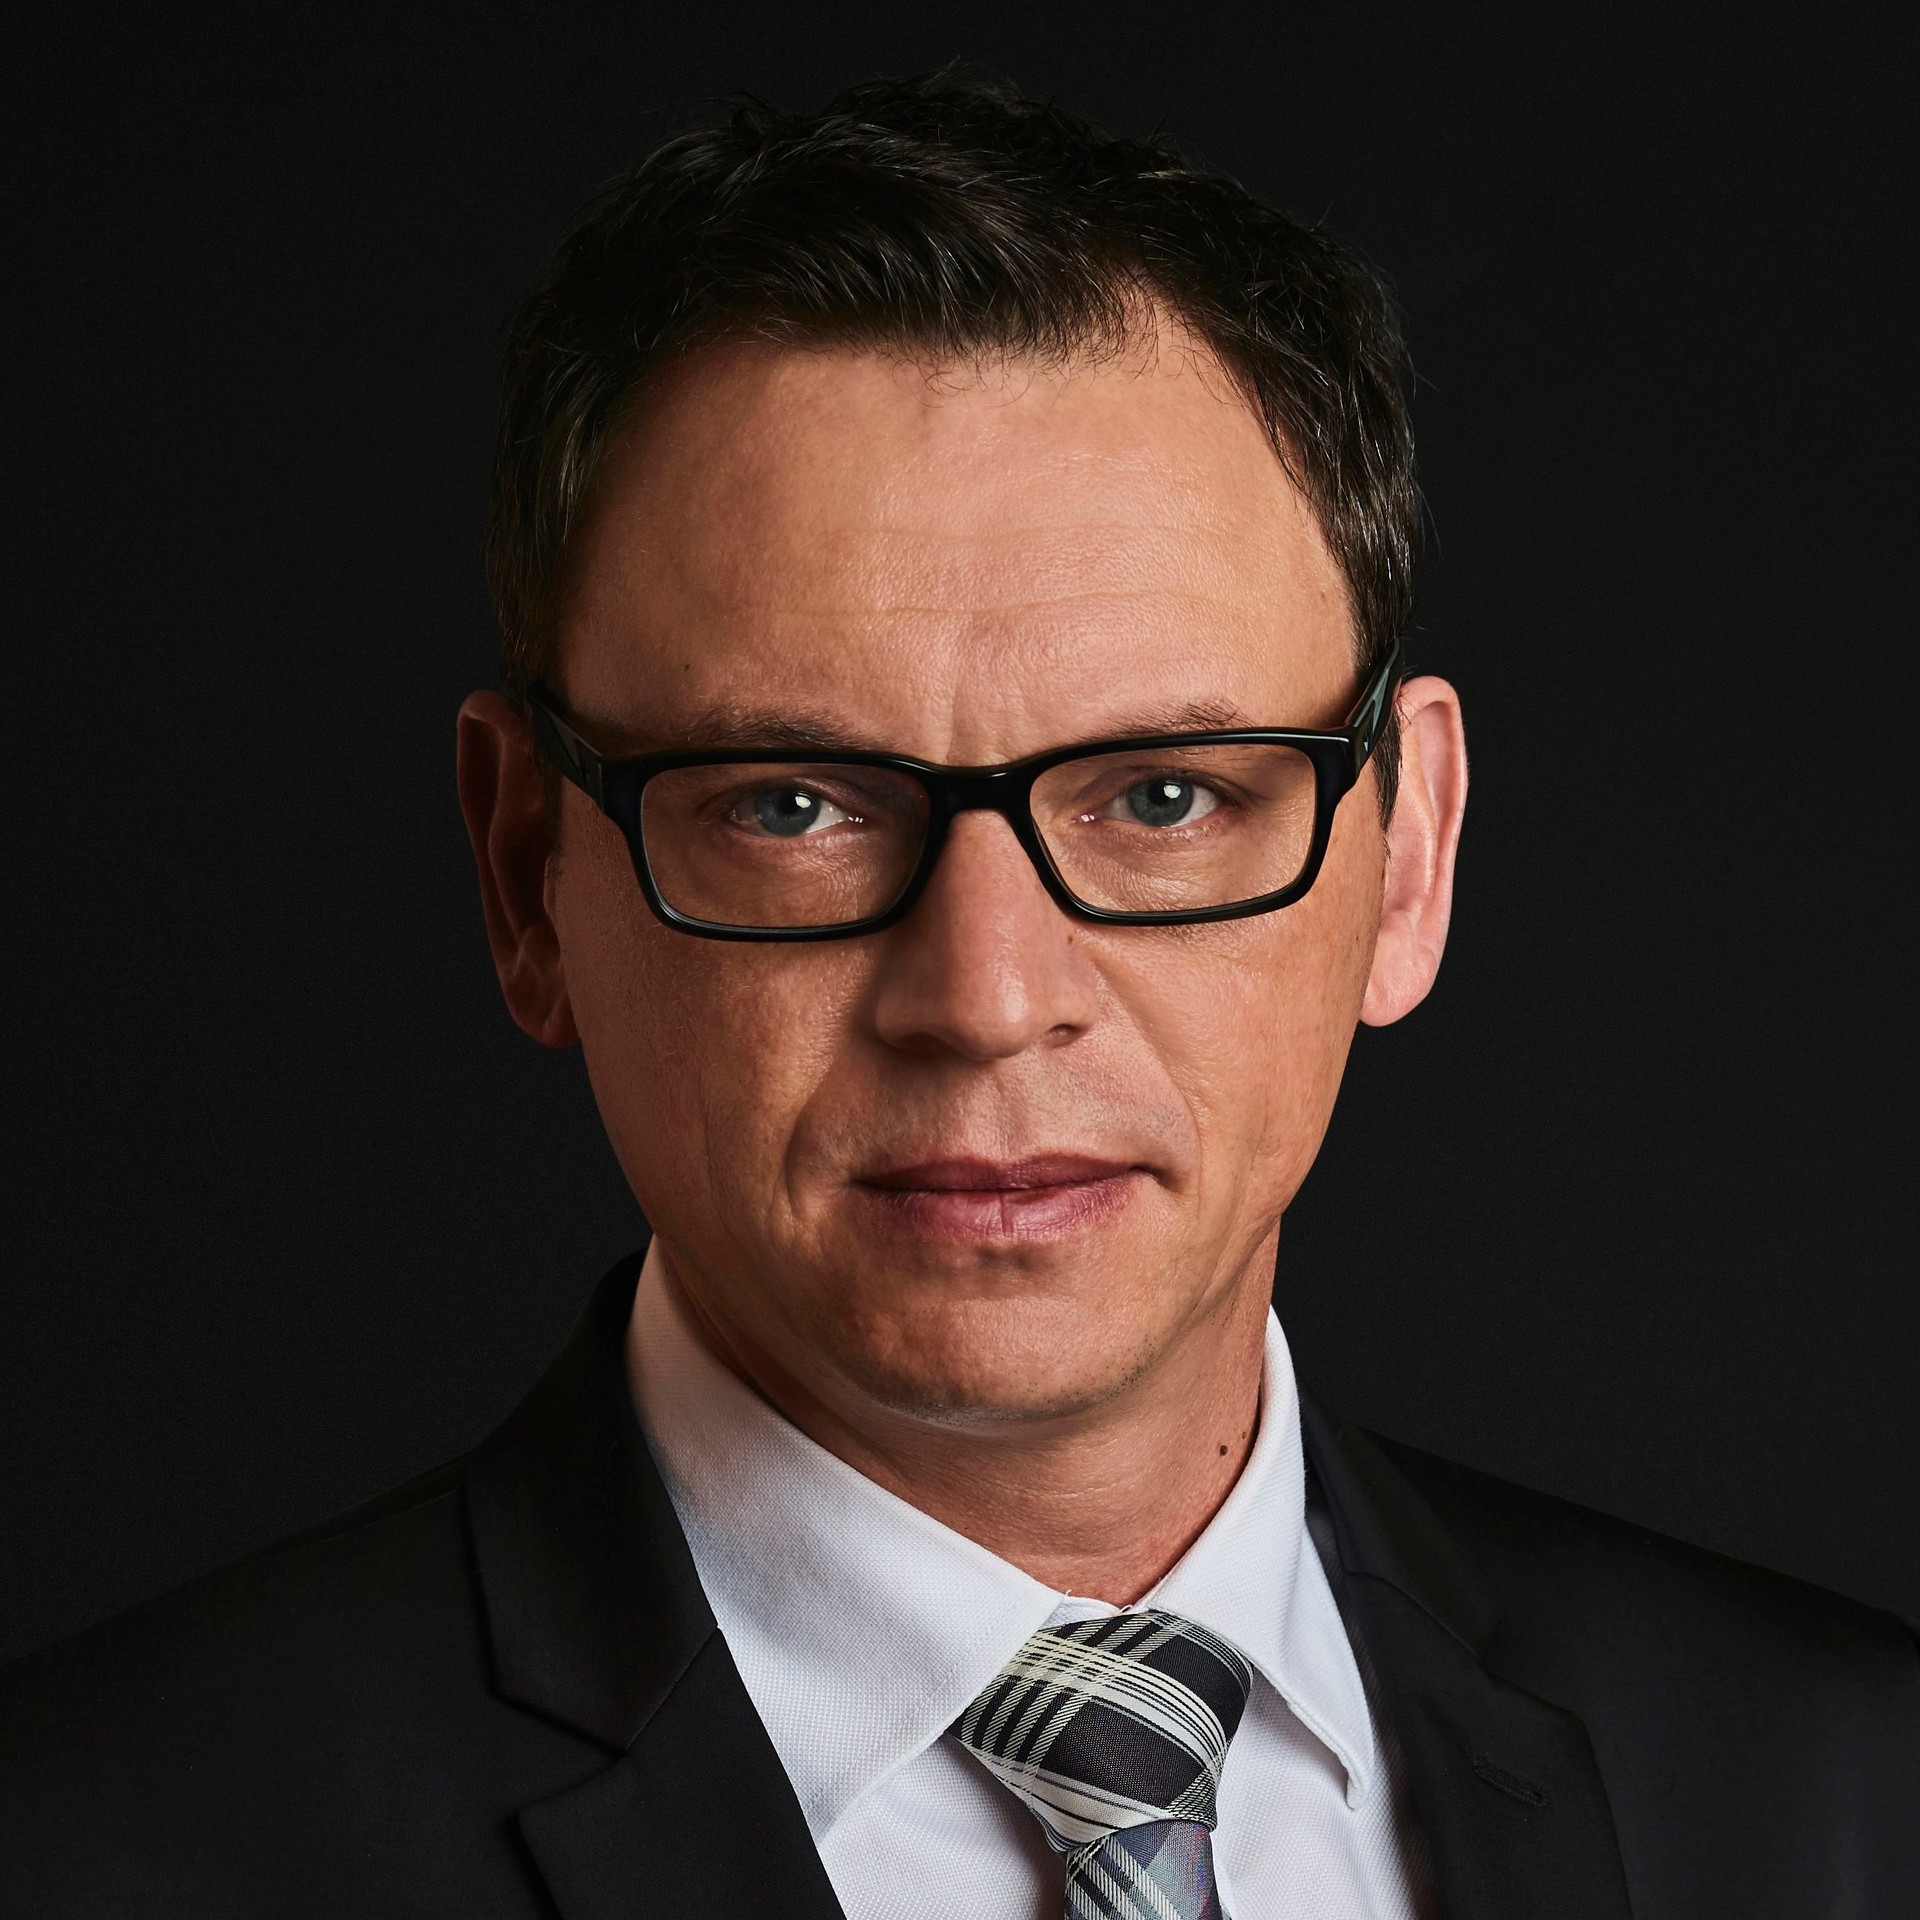 Photo of Georg Oppitz, BSc, MBA